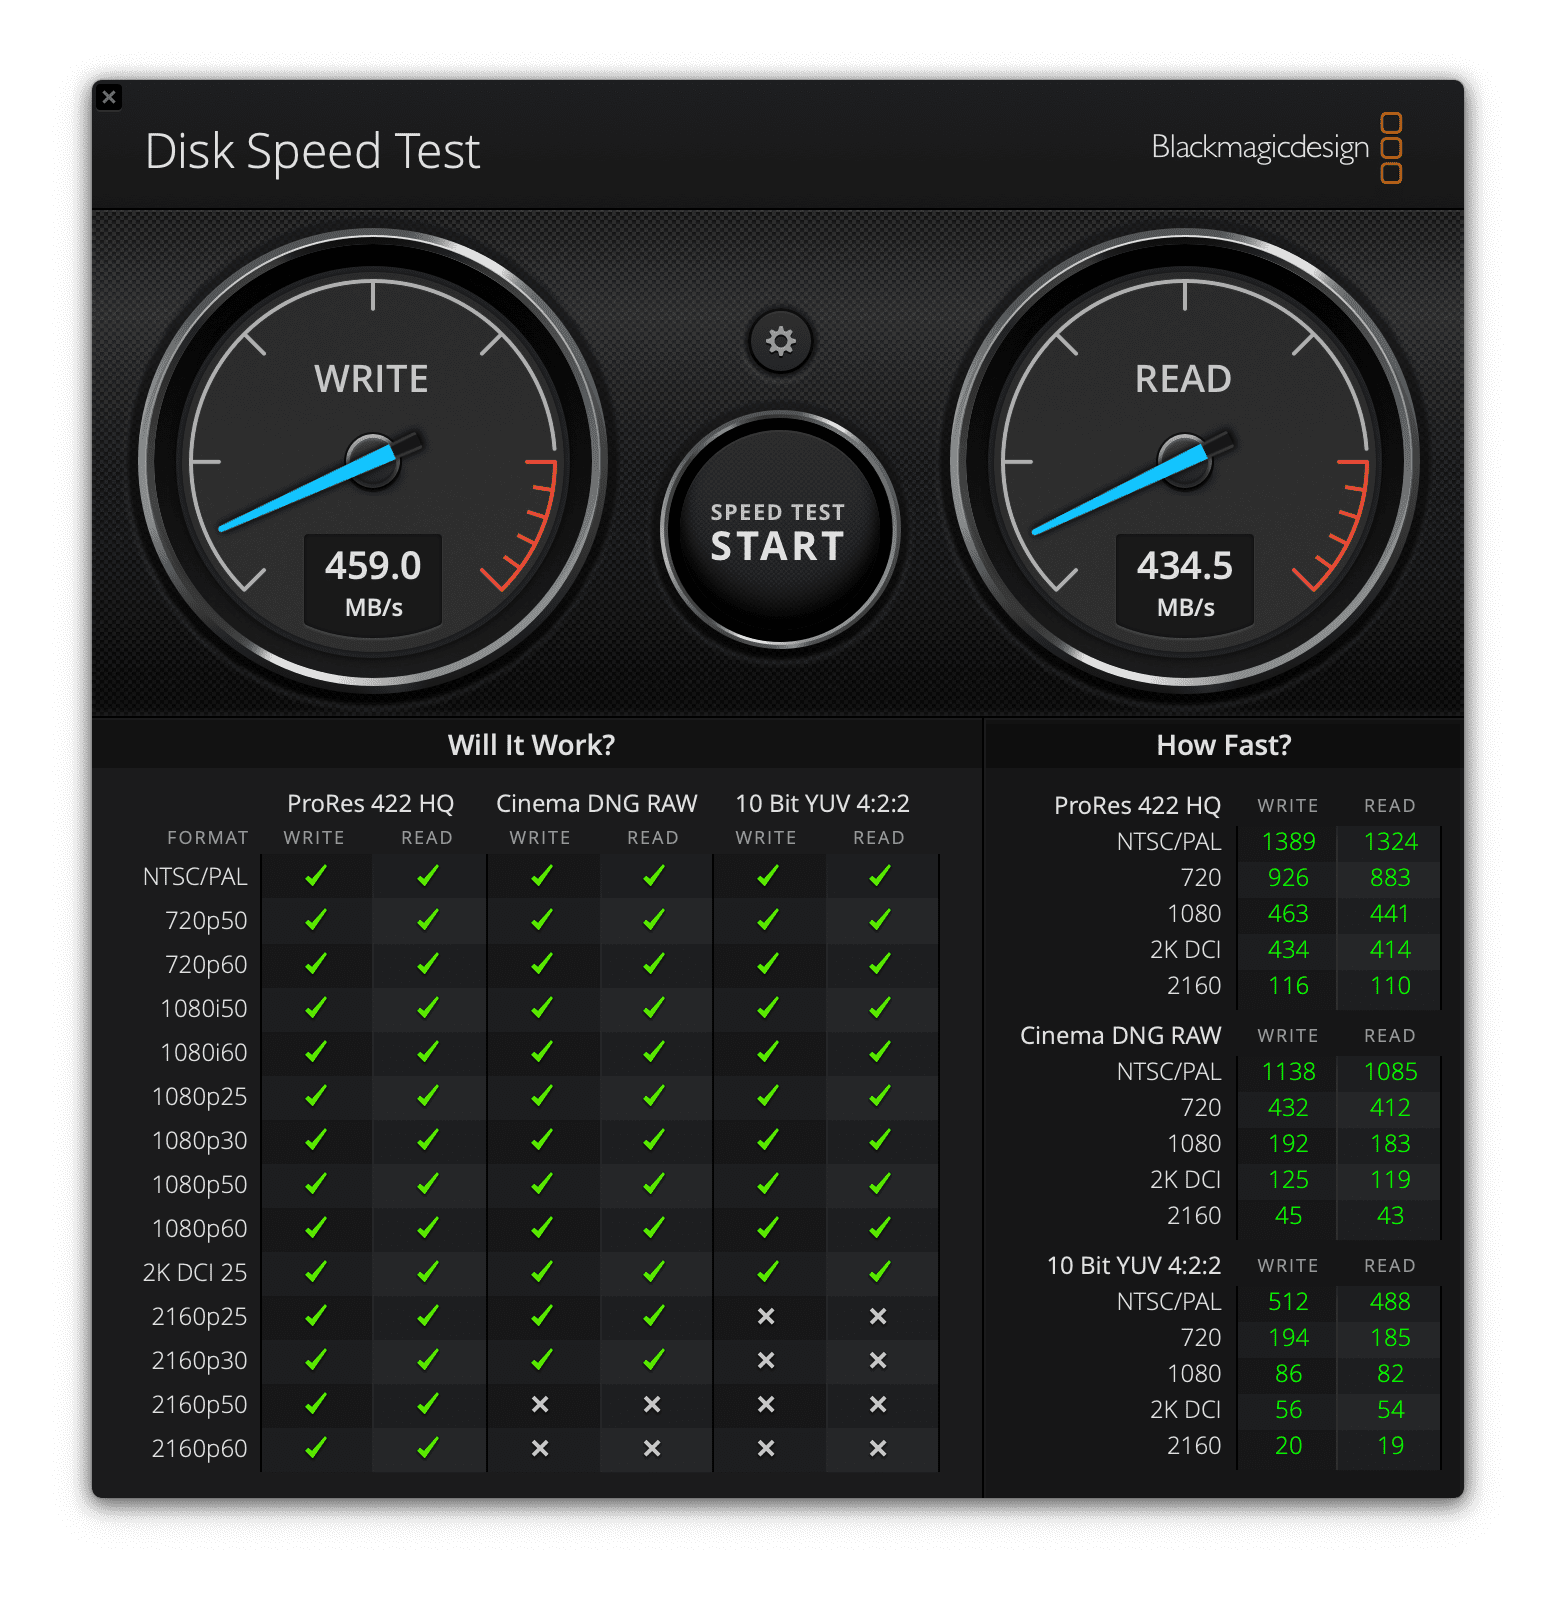 Les résultats du benchmark du X210 Elite : environ 450 Mb/s